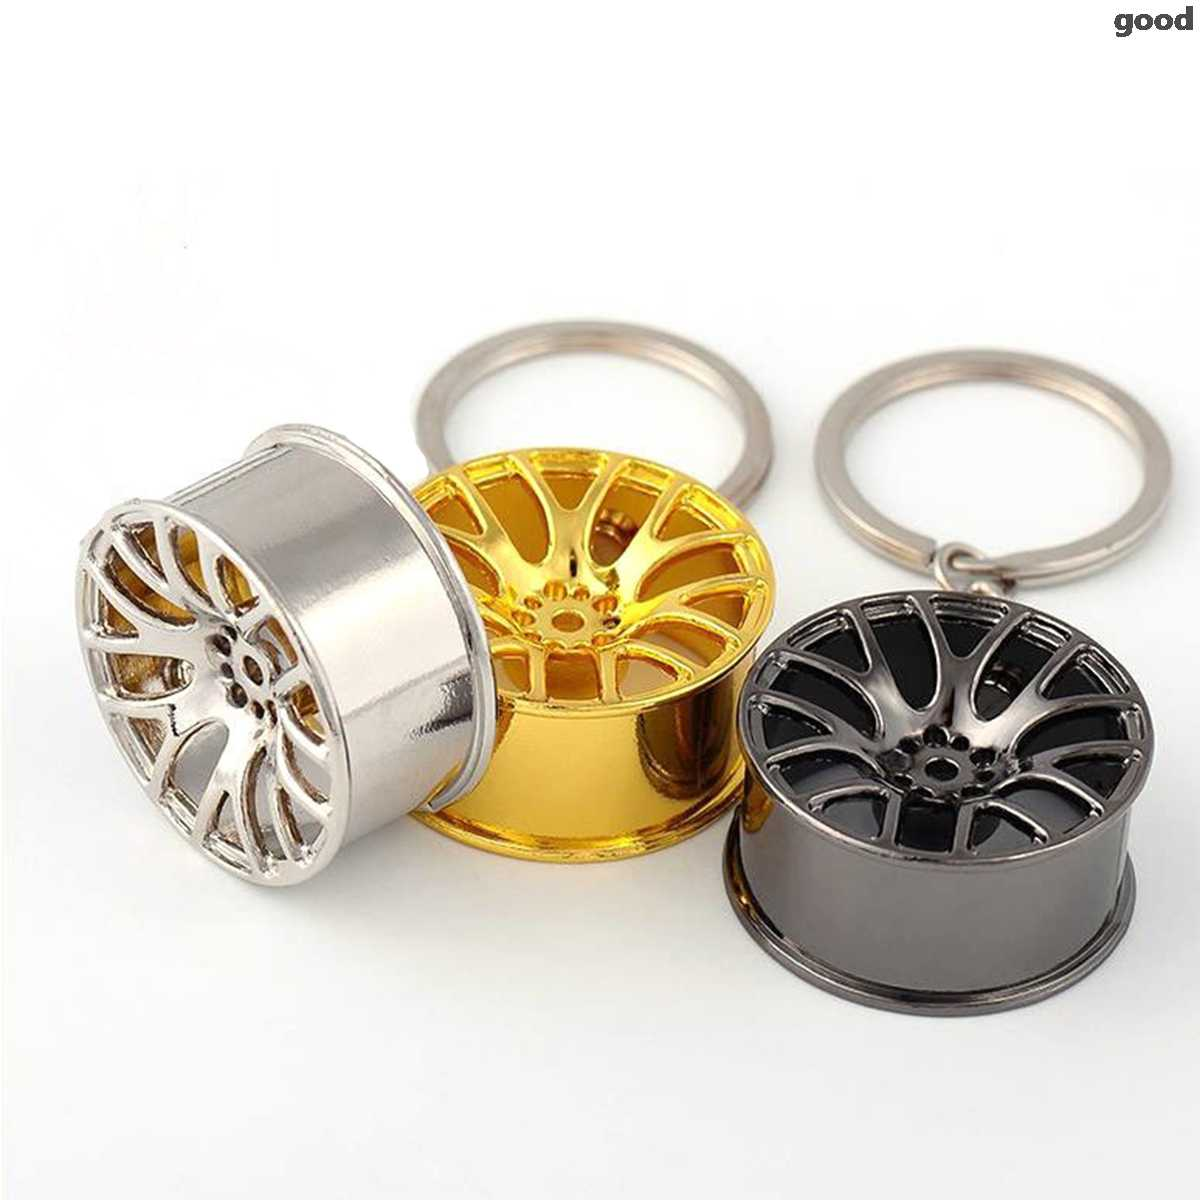 Roda de carro de metal aro modelo mini pneu chaveiro para renault bmw audi lada opel skoda mazda ford fiat assento volvo renault